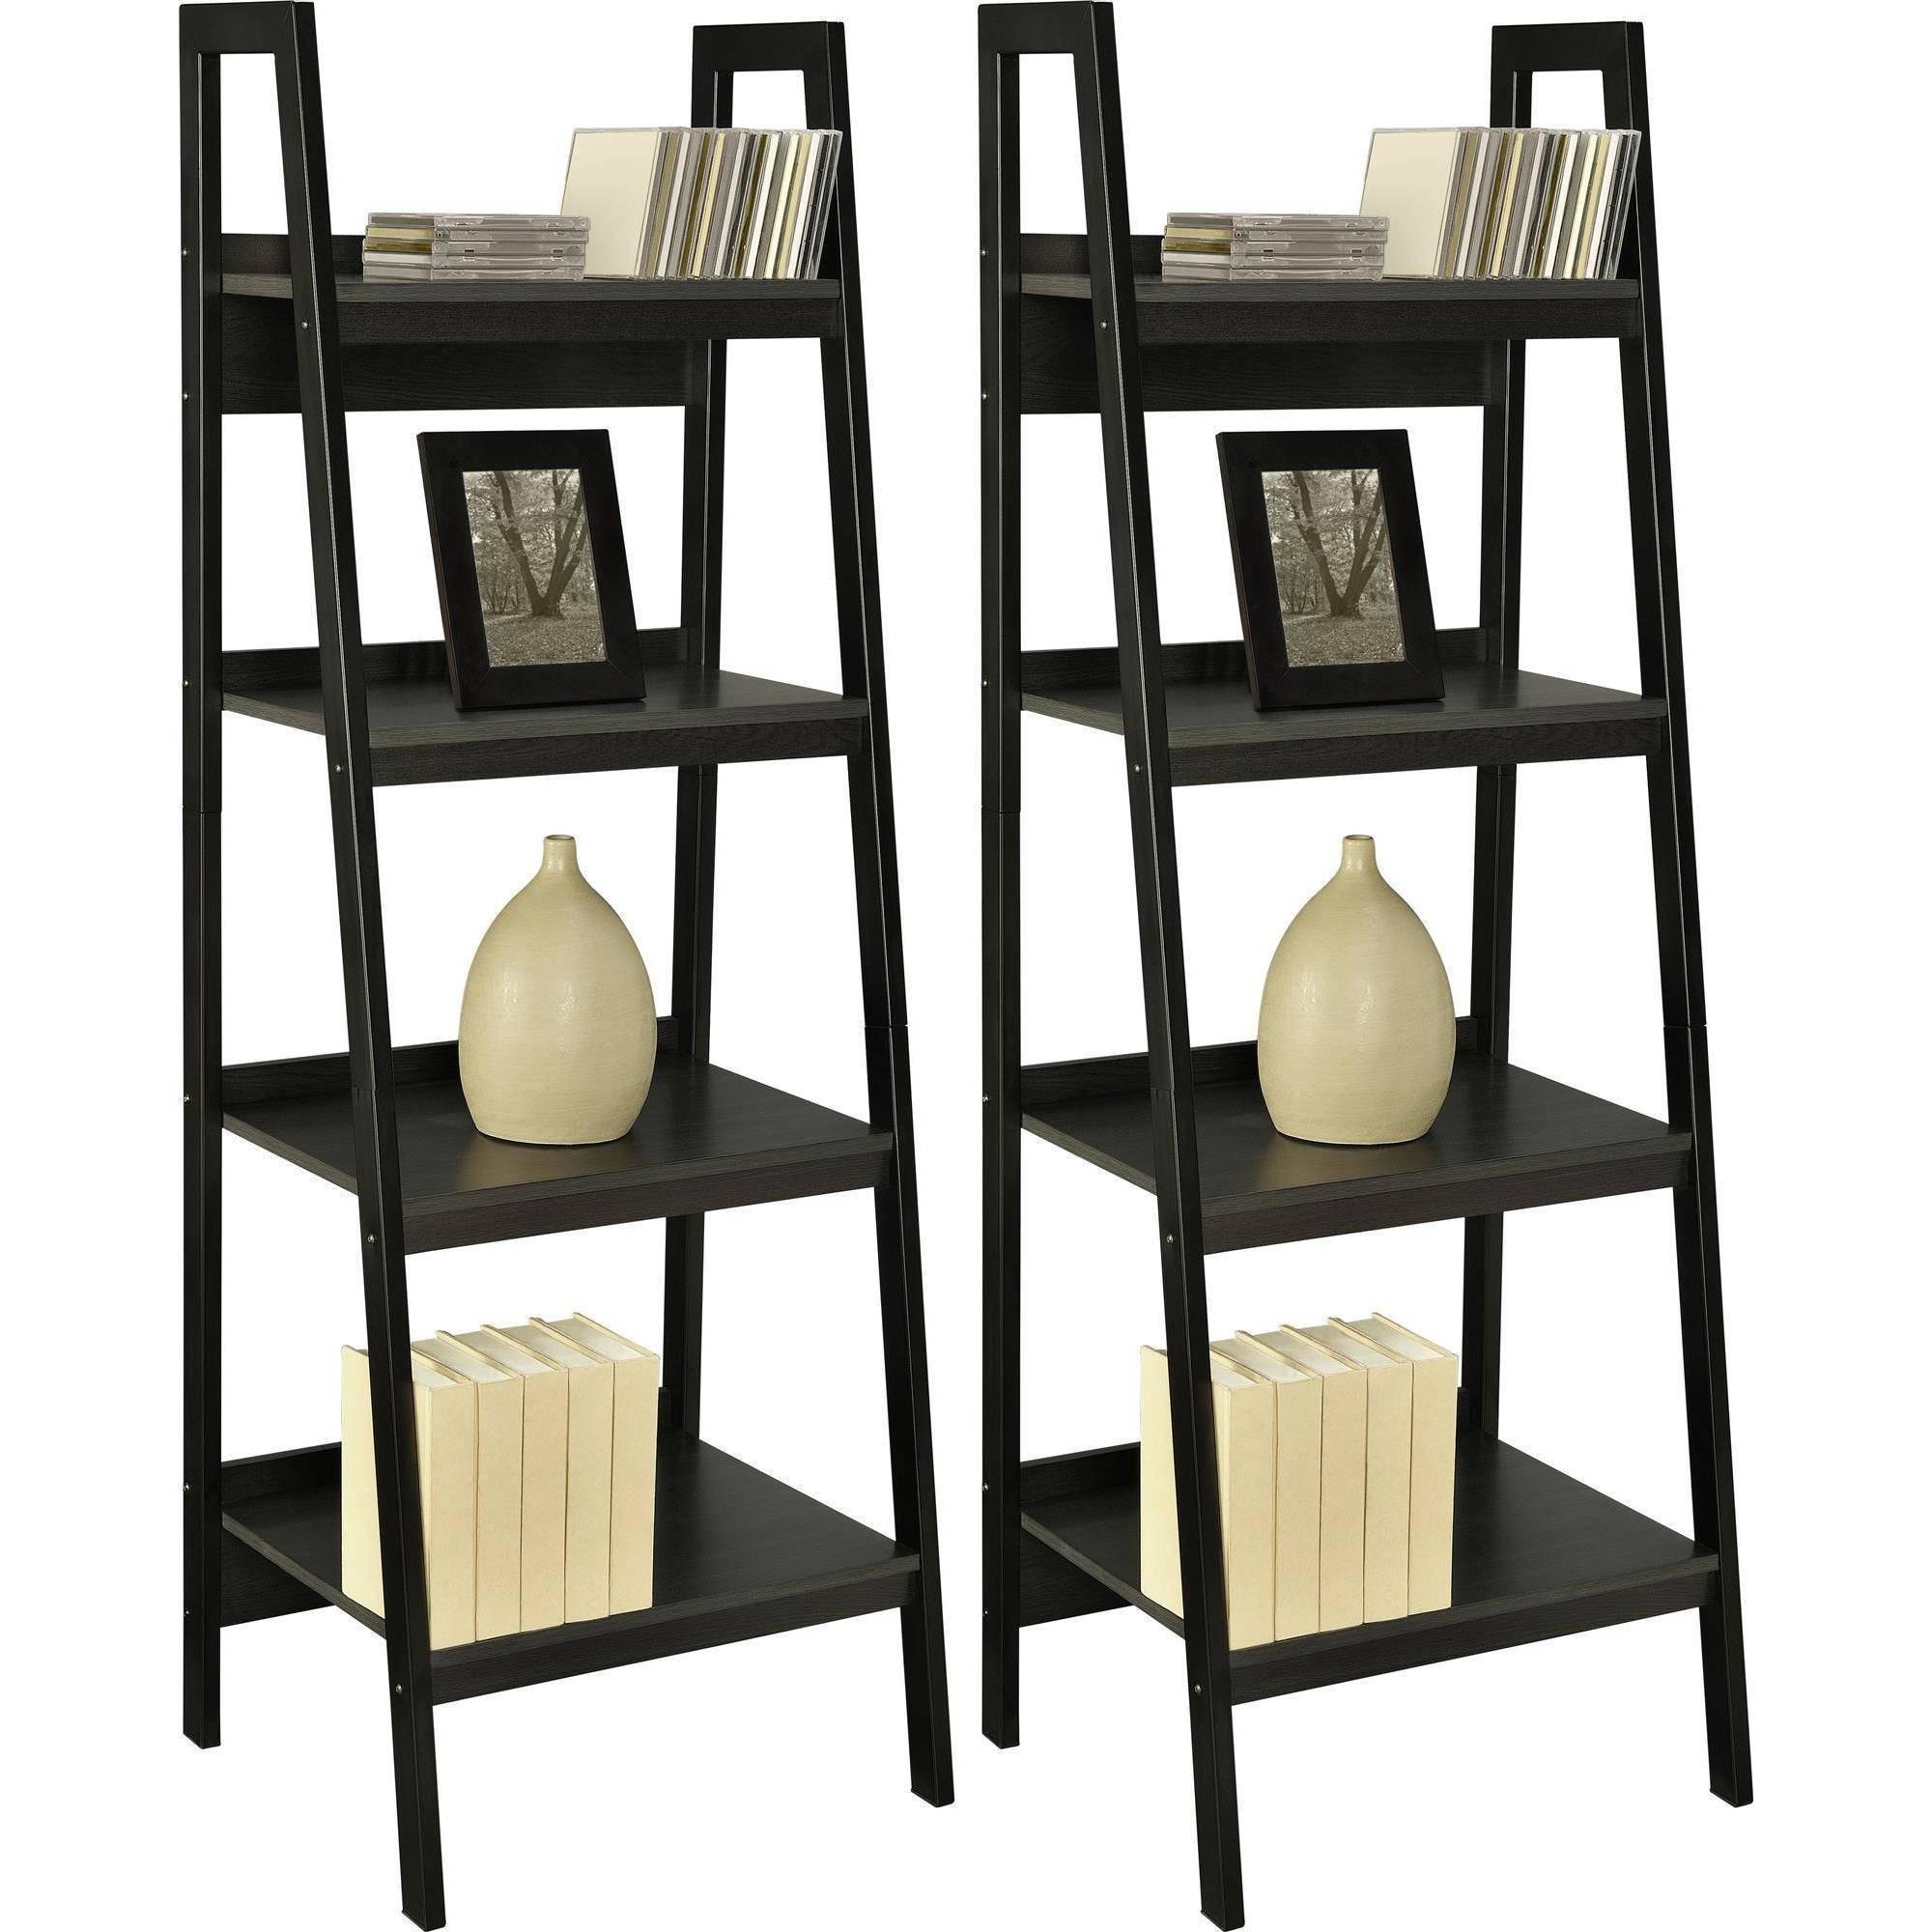 Ameriwood Home Lawrence 4 Shelf Ladder Bookcase Bundle Black Set Throughout Ladder Bookcase (View 7 of 15)